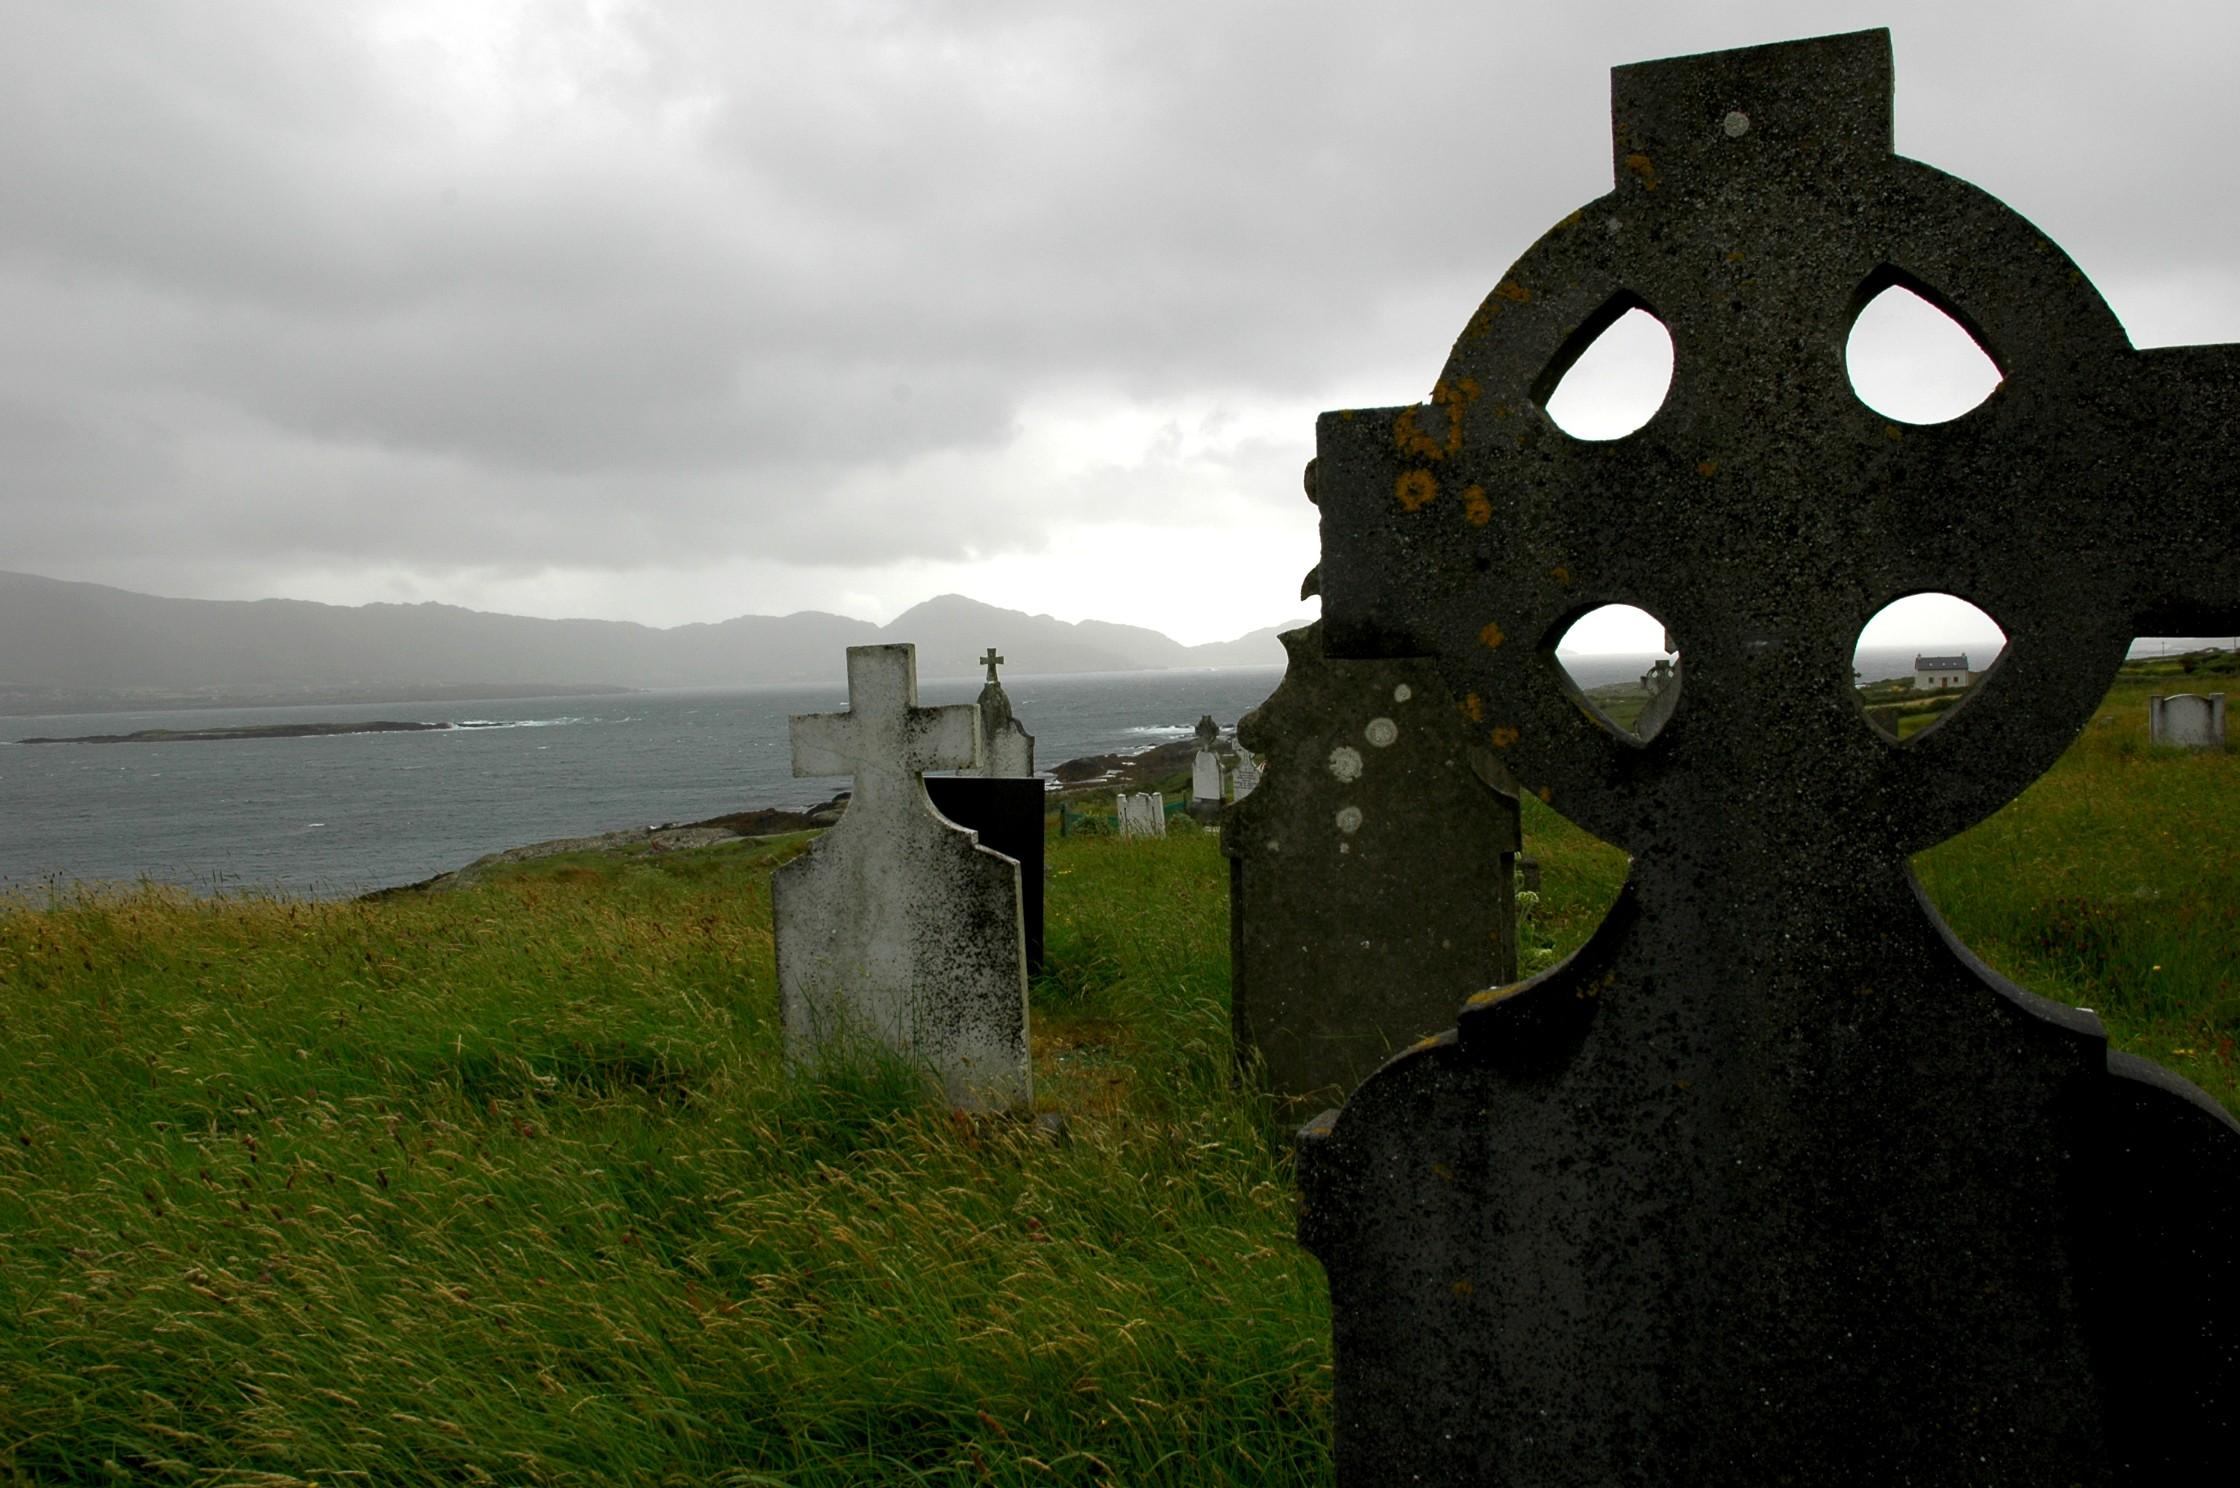 1488 in Ireland